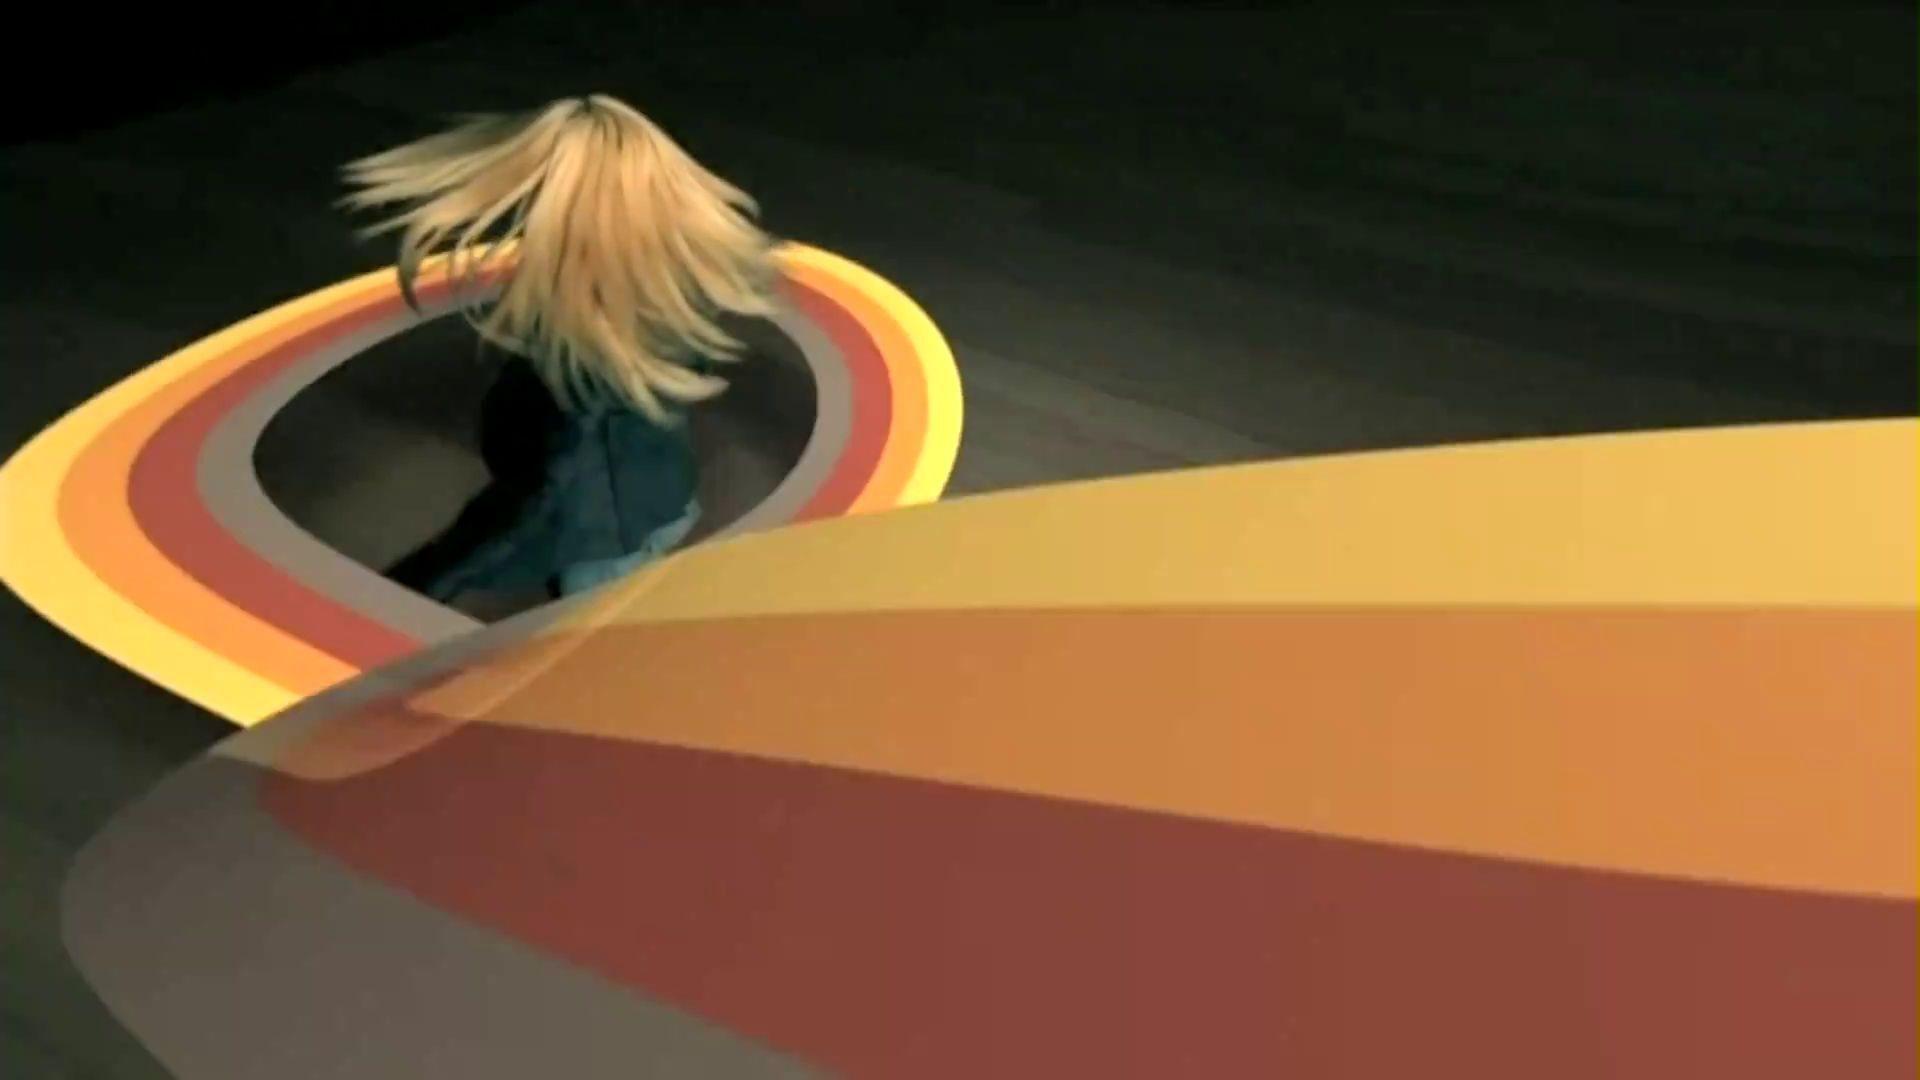 Hilary Duff - So Yesterday - Music Video - Hilary Duff ... Hilary Duff Songs